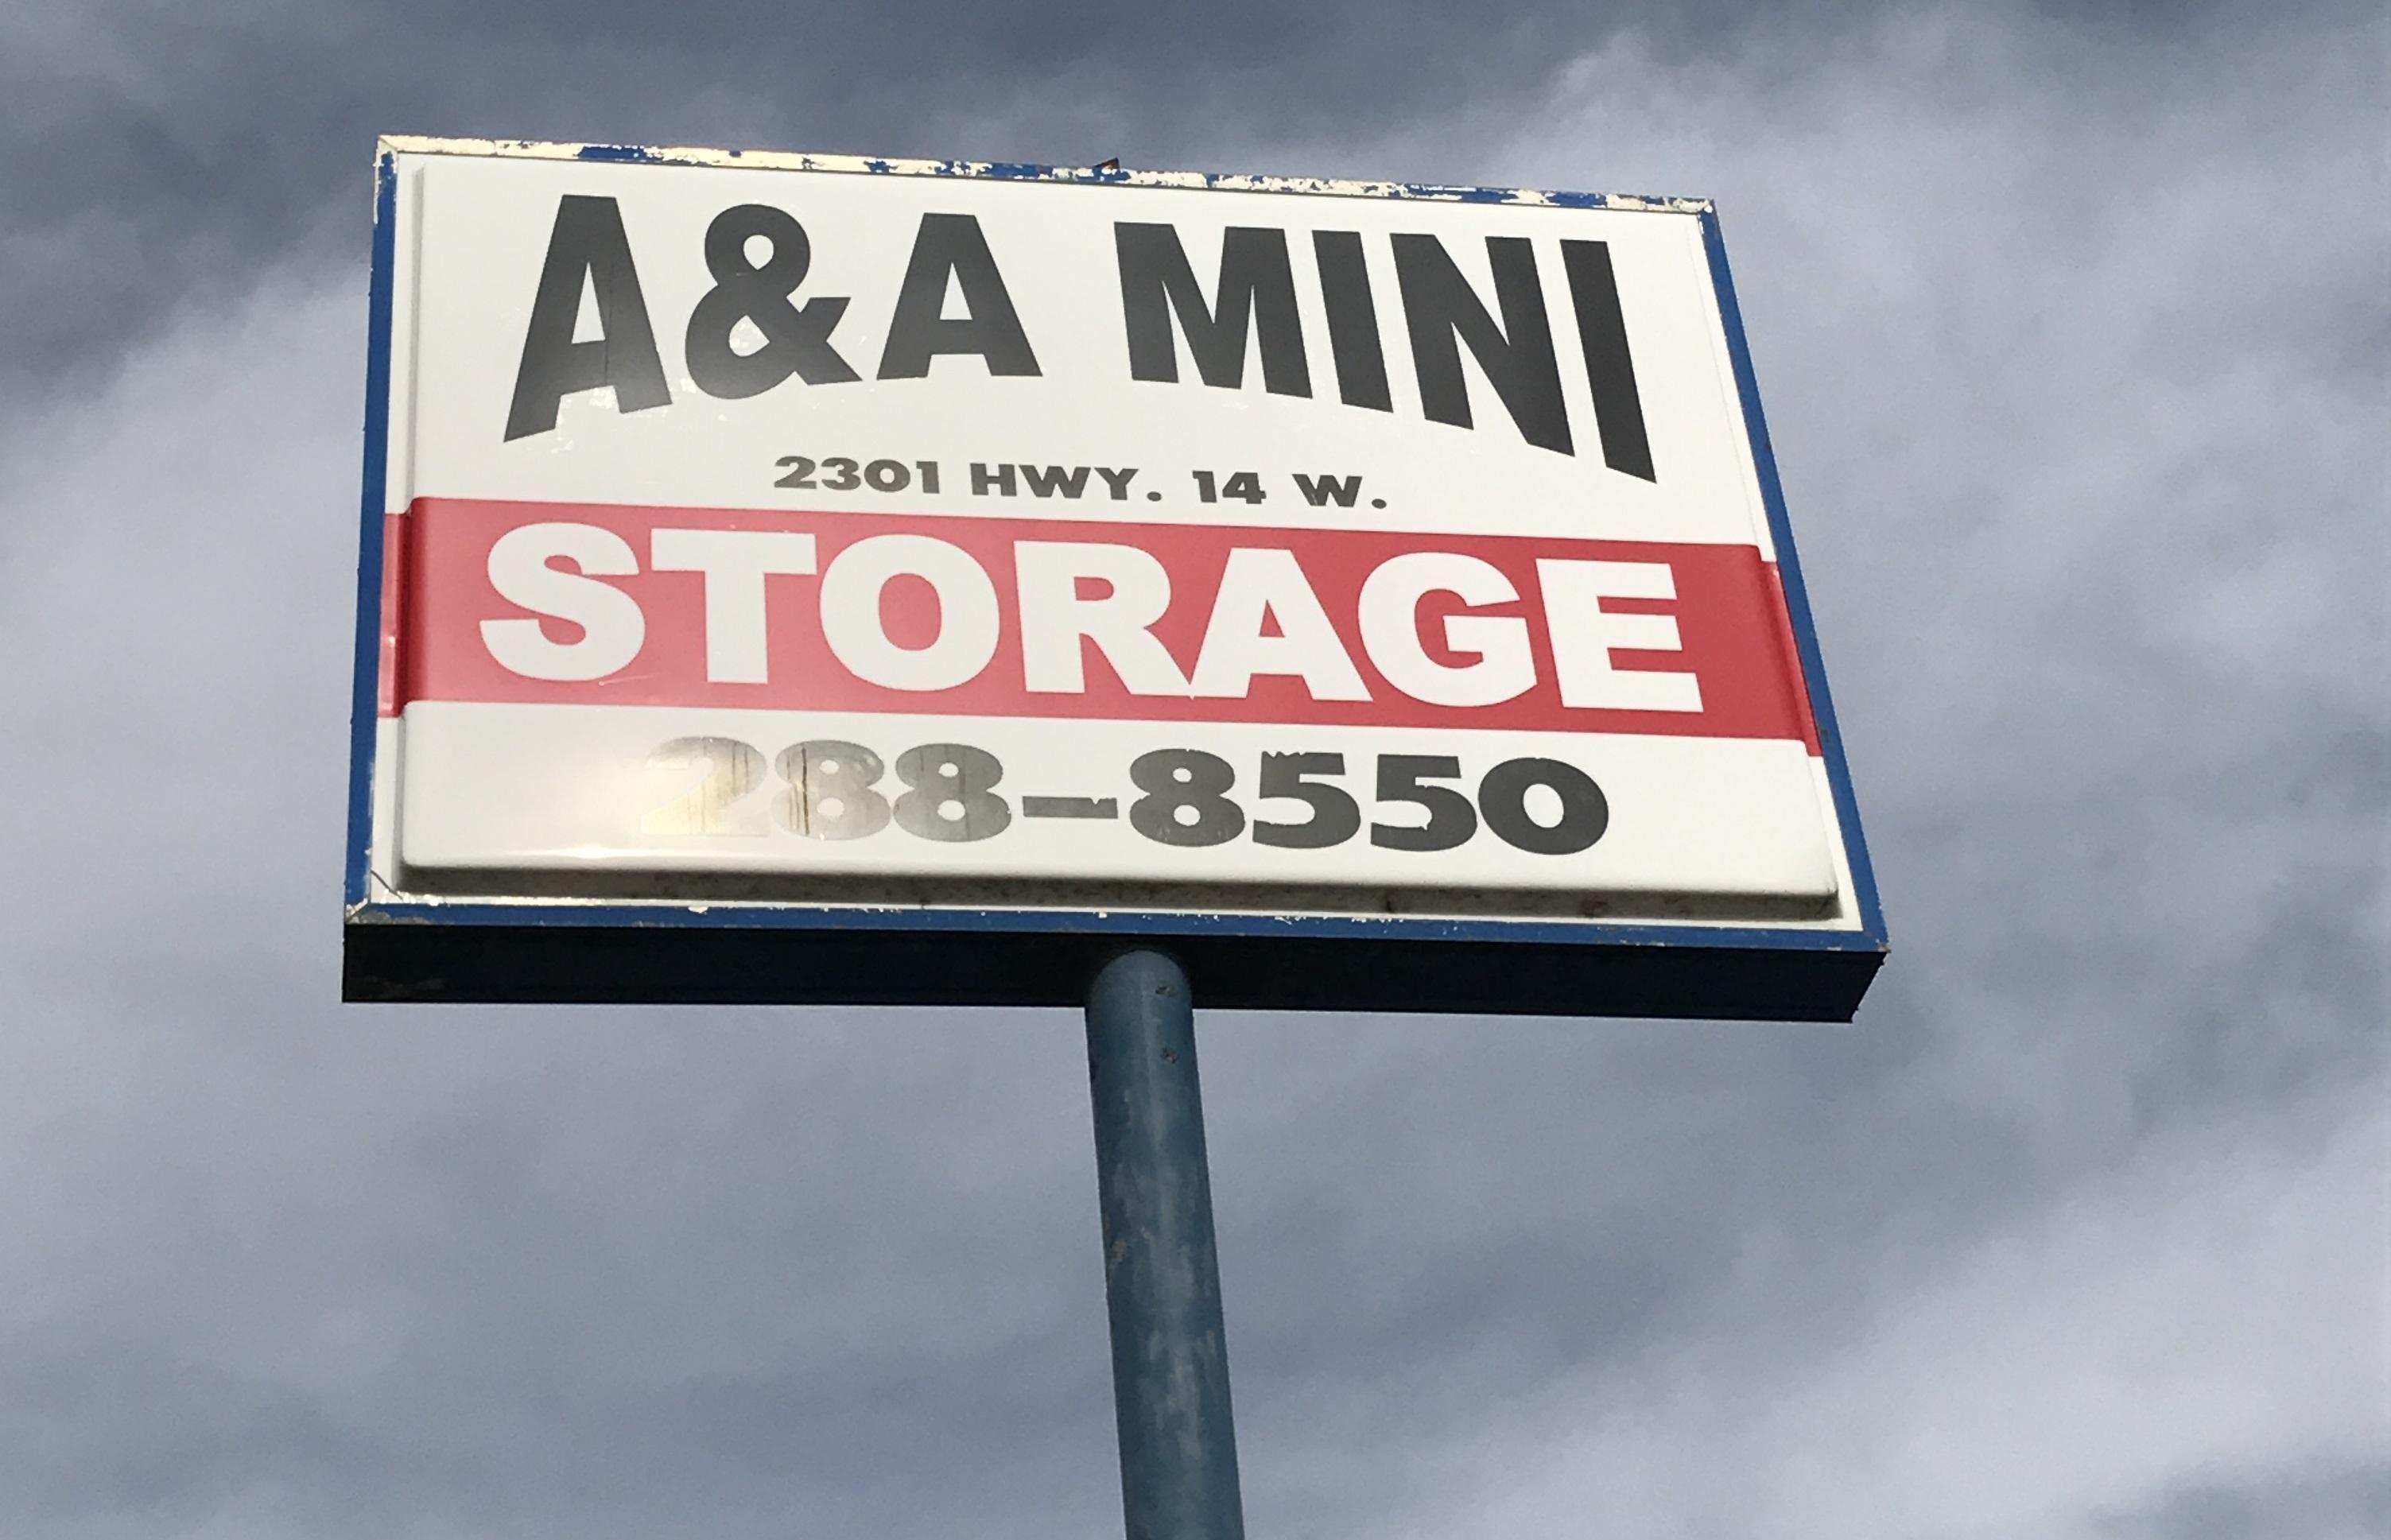 commercial storage rochester minnesota a a mini storage. Black Bedroom Furniture Sets. Home Design Ideas